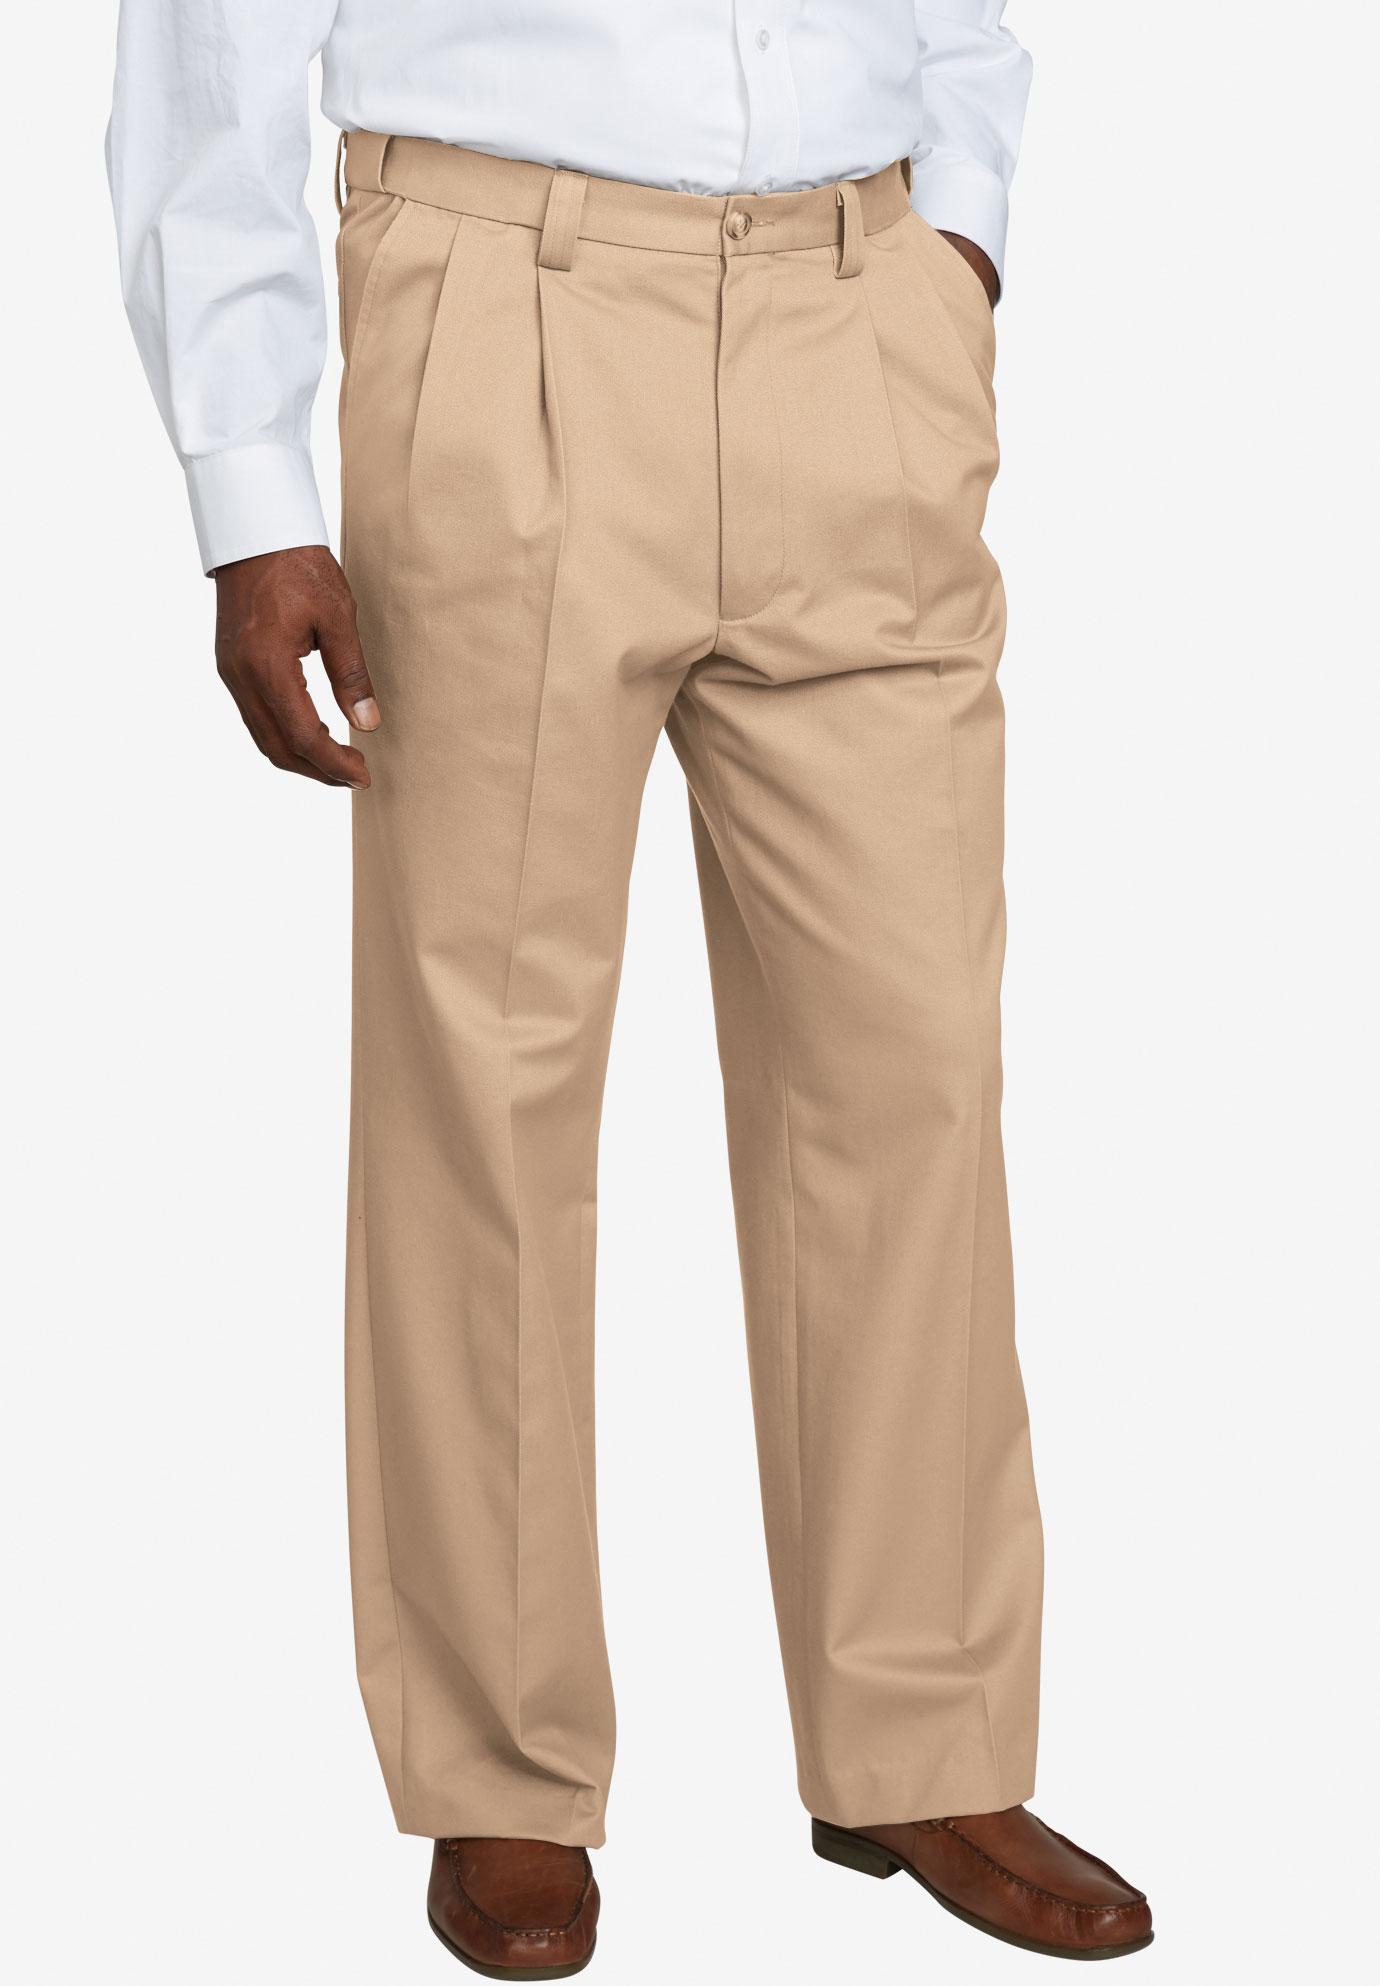 KingSize Mens Big /& Tall Signature Fit Wrinkle-Resistant Pleat Front Dress Pants